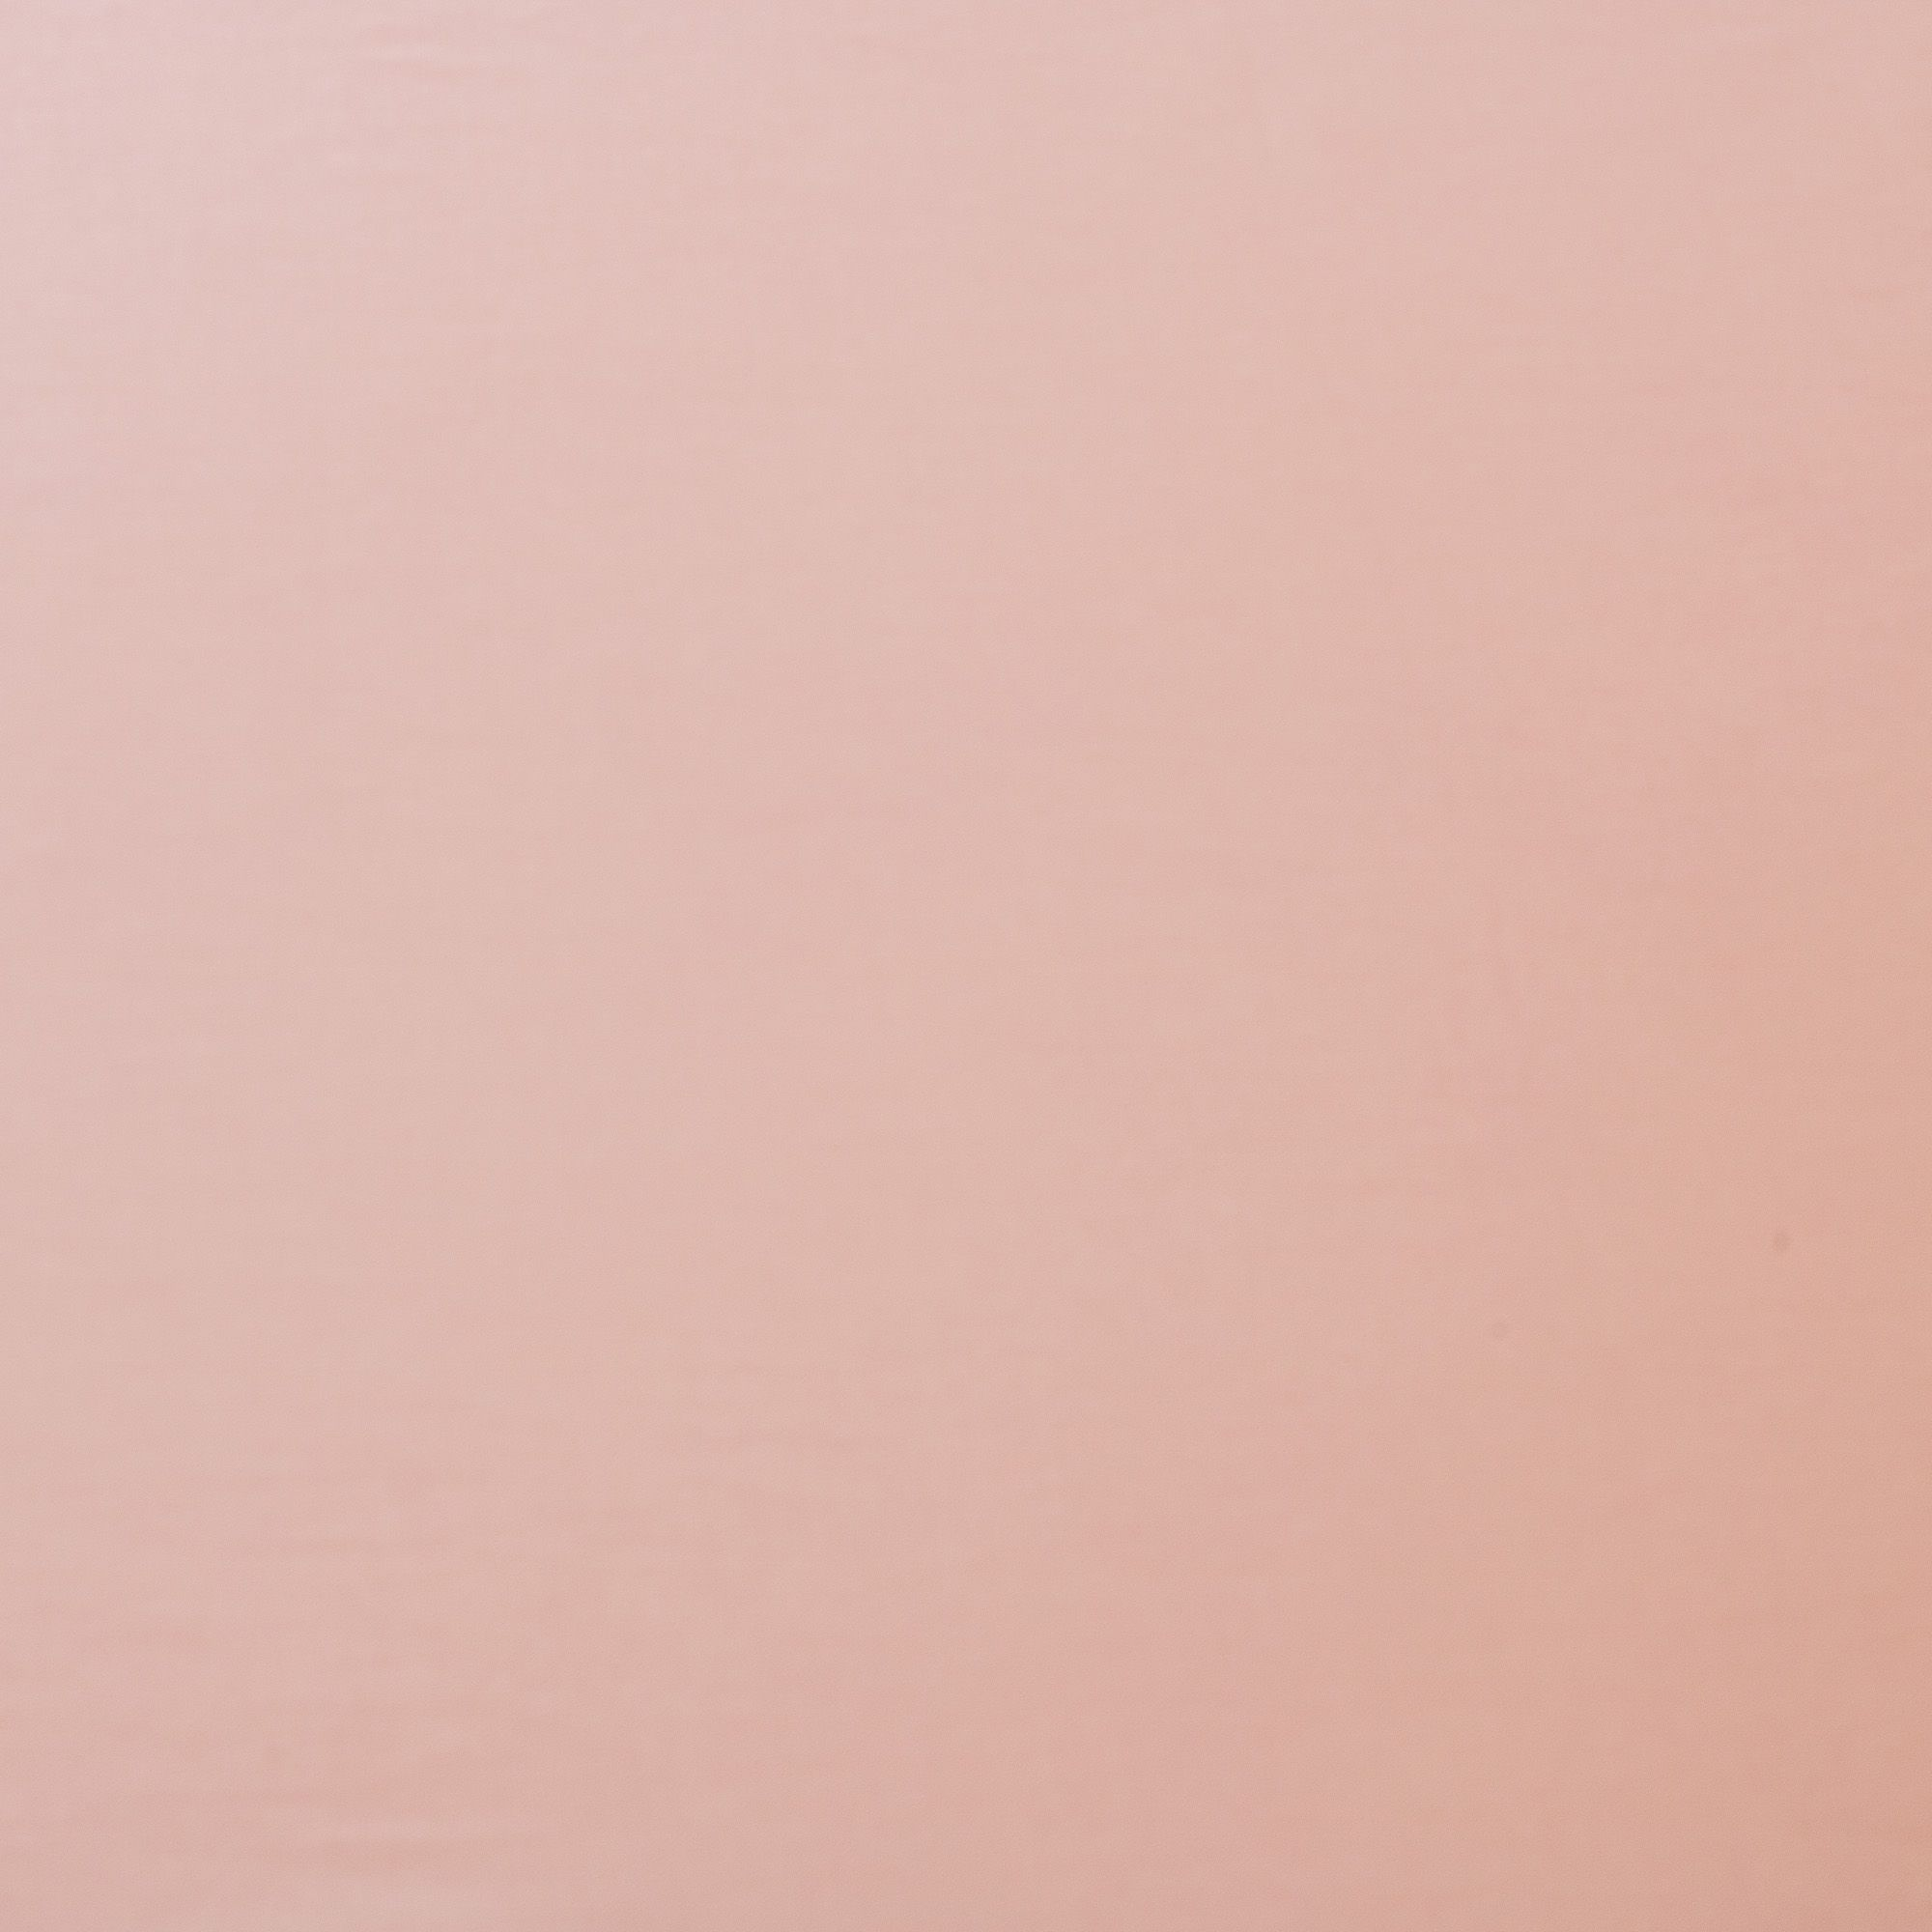 Tecido Bengaline Rosê Liso 1,45 Mt Largura